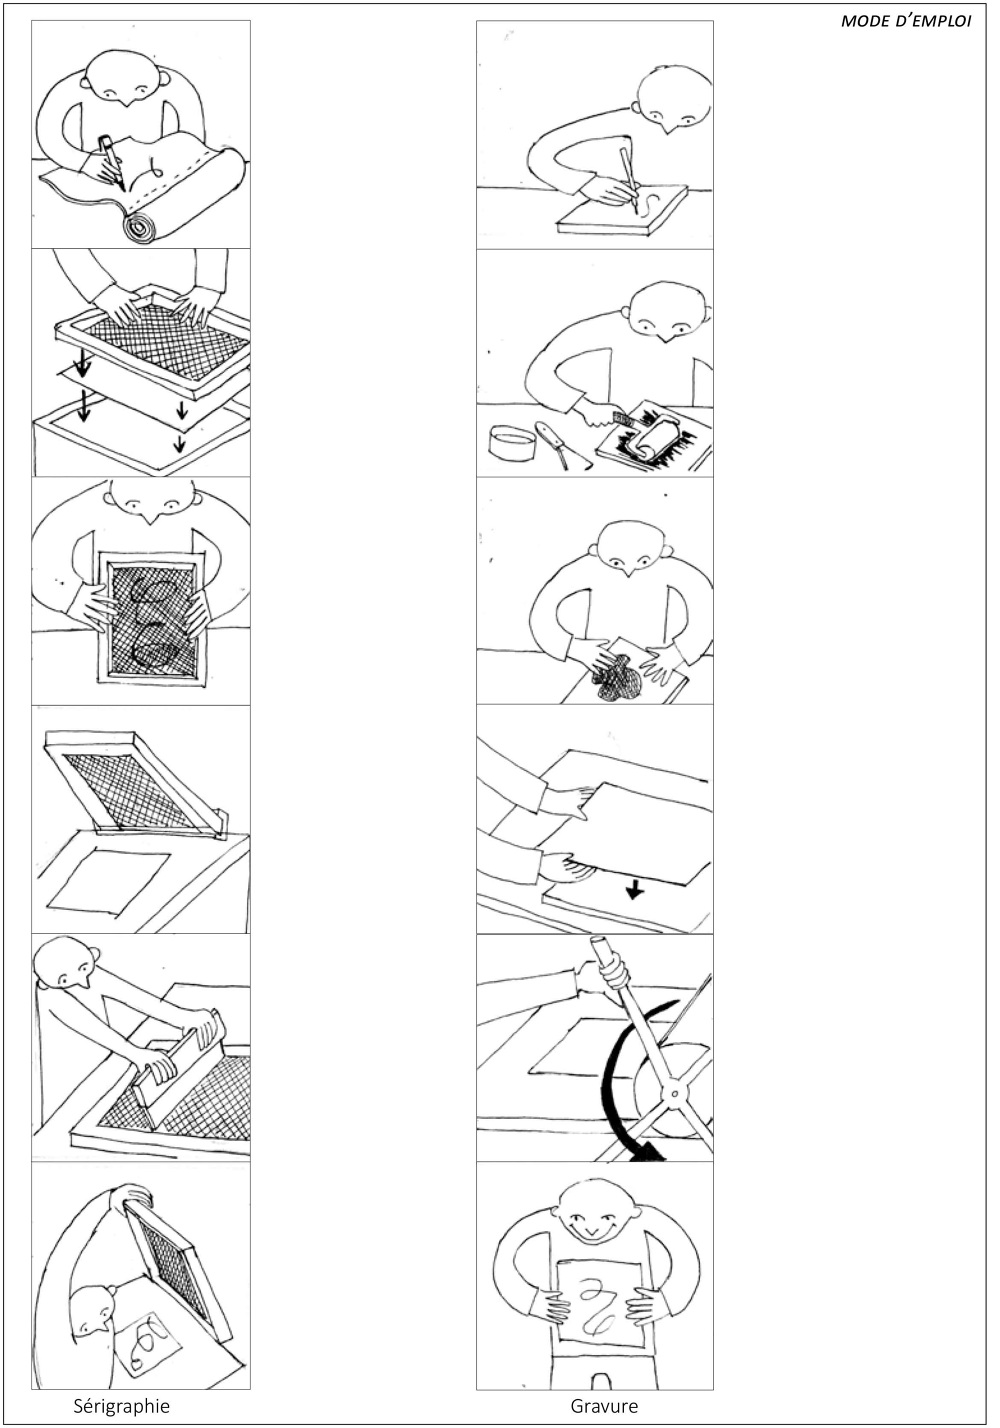 mat riel et mode d 39 emploi marie bonnin. Black Bedroom Furniture Sets. Home Design Ideas